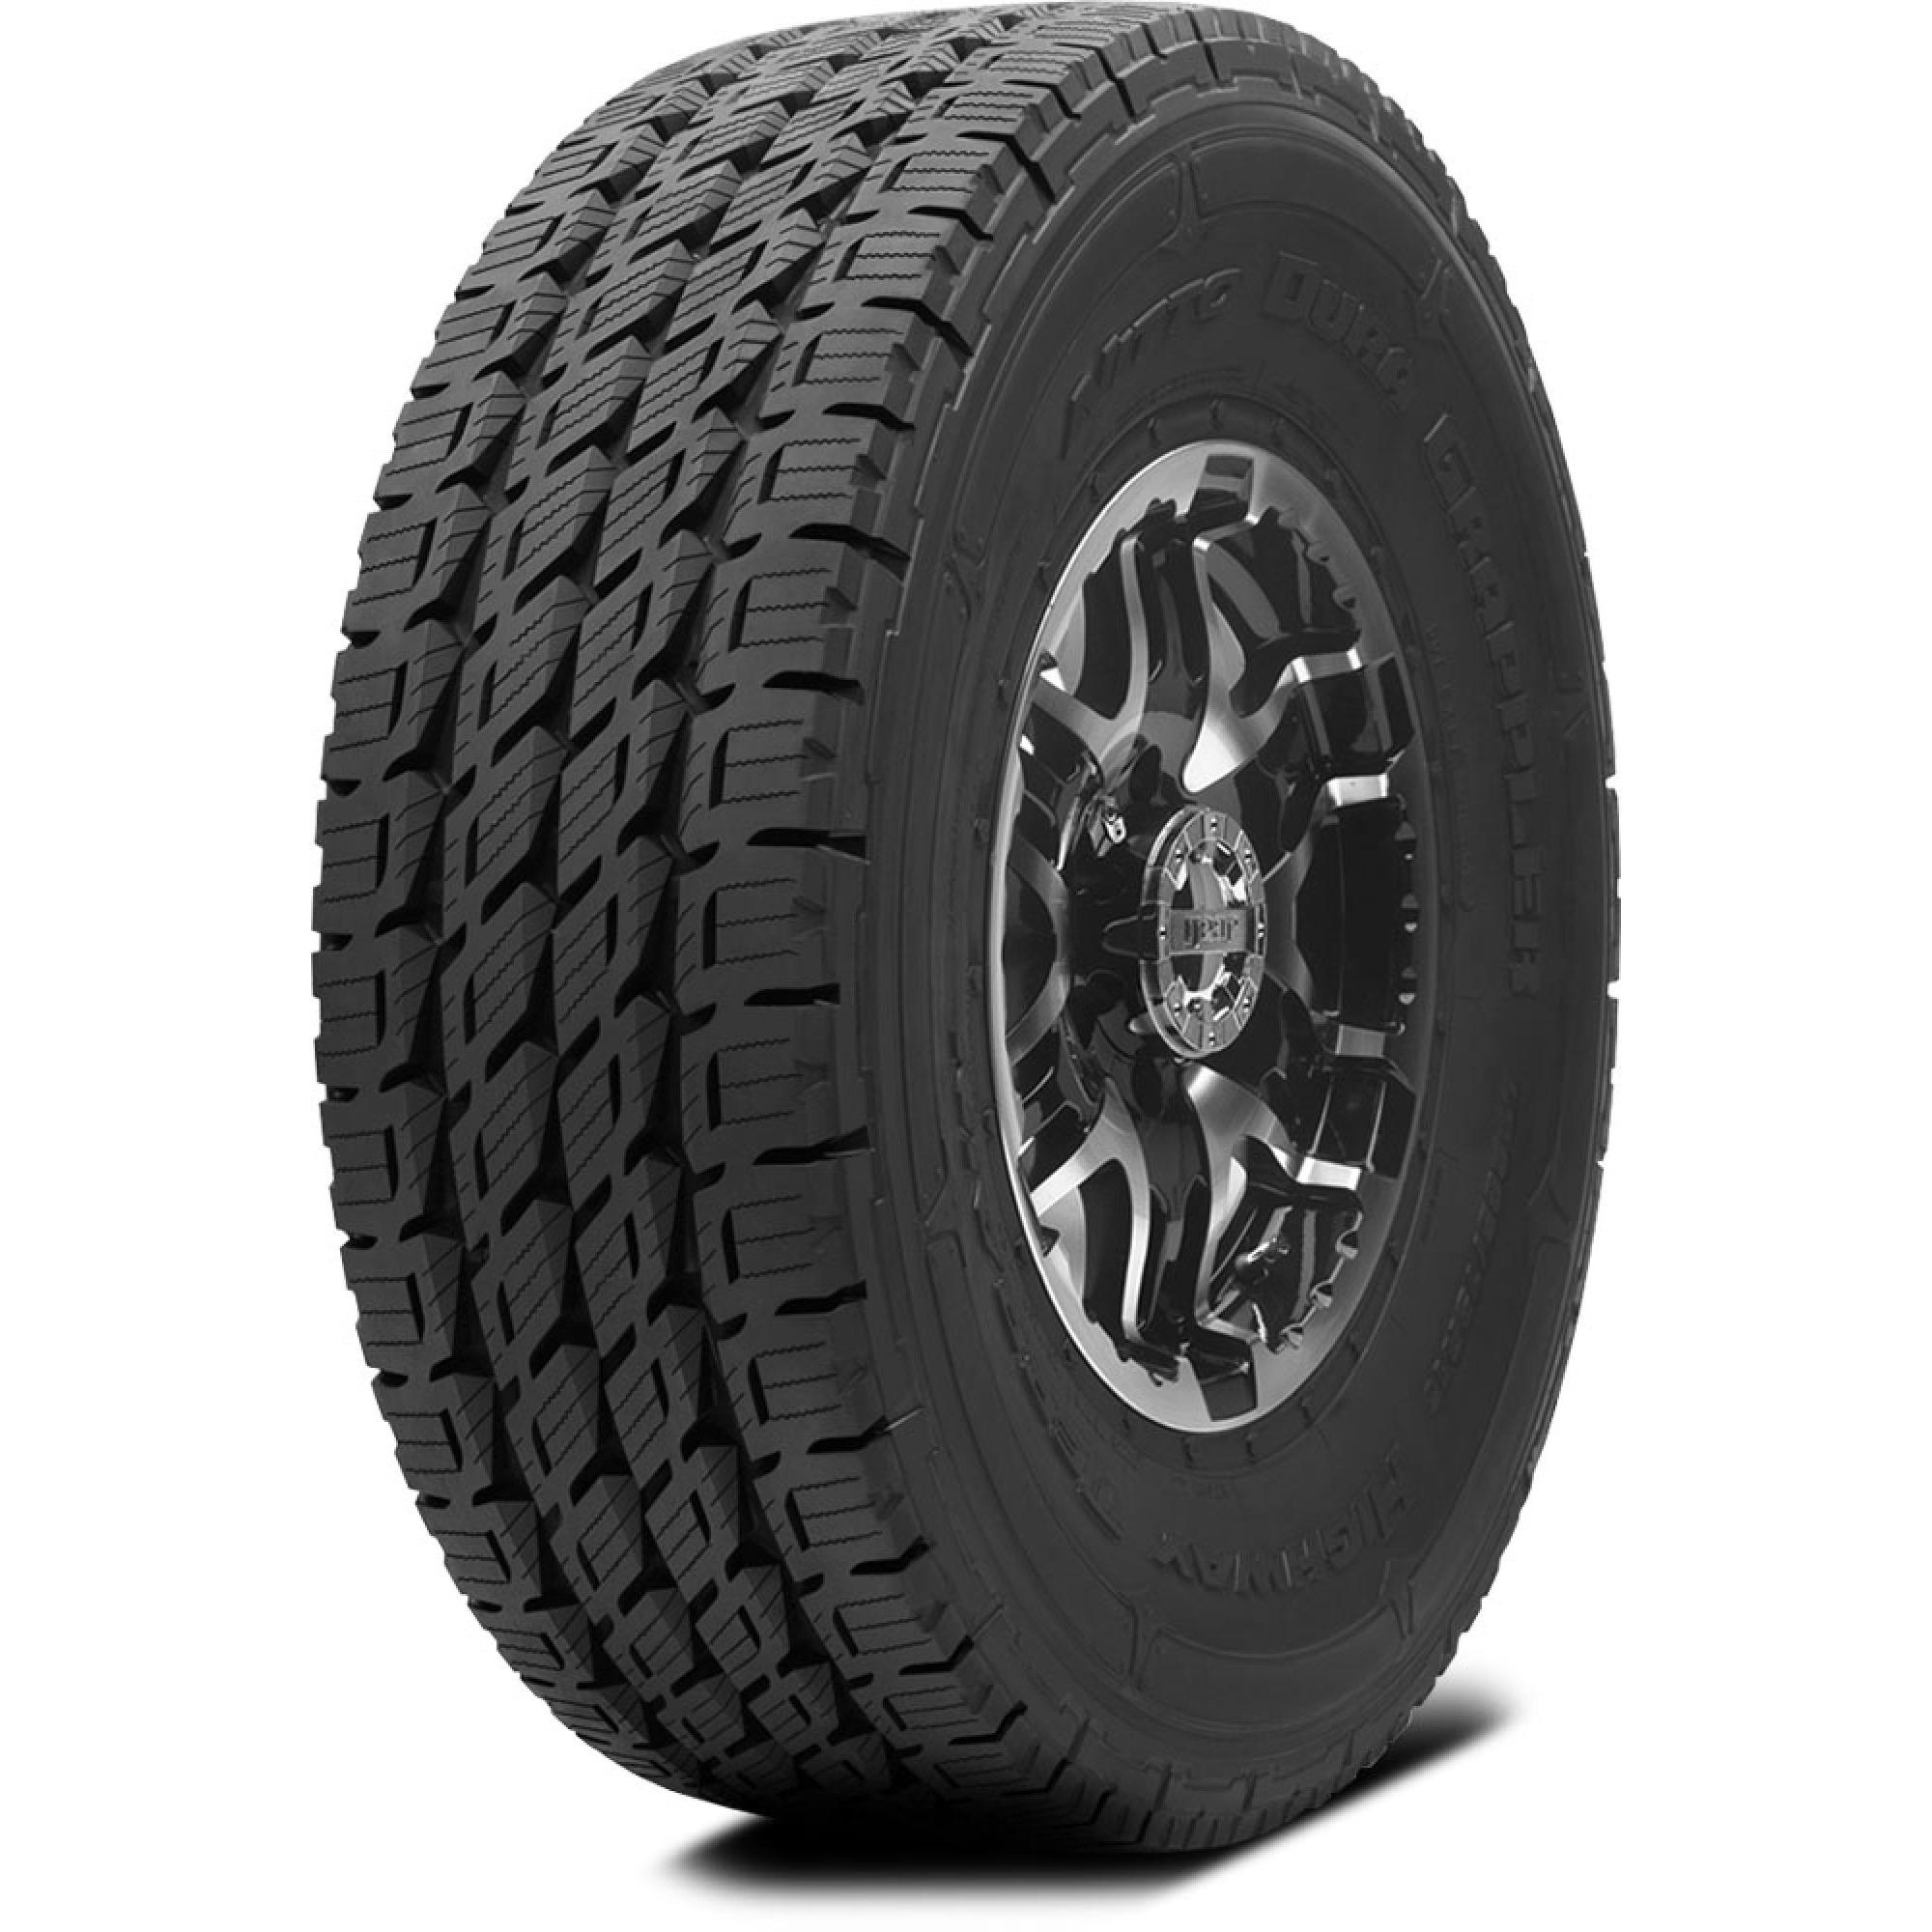 автомобильные шины Nitto Dura Grappler 245/75 R16 120/116R